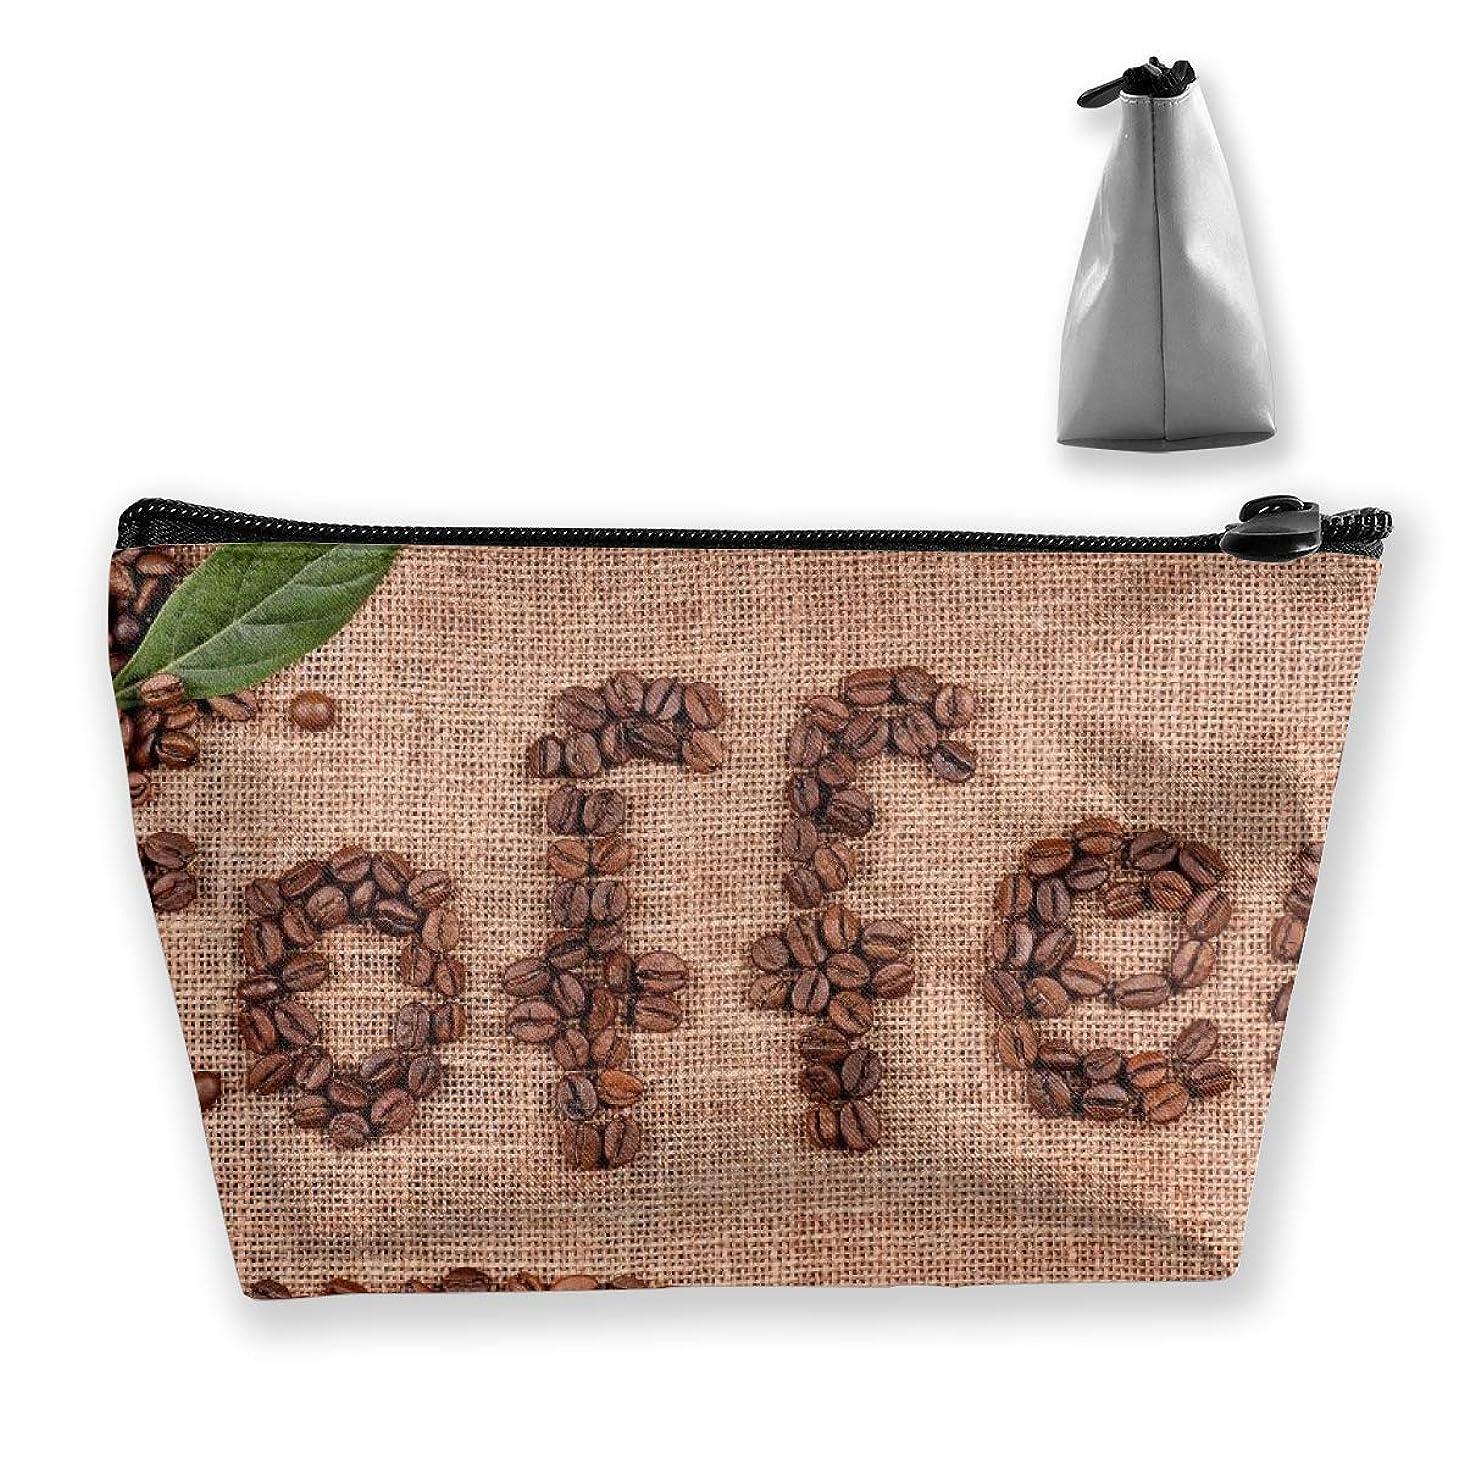 Makeup Bag Cosmetic Creative Coffee Bean Design Portable Bag Mobile Trapezoidal Storage Bag Travel Bags With Zipper